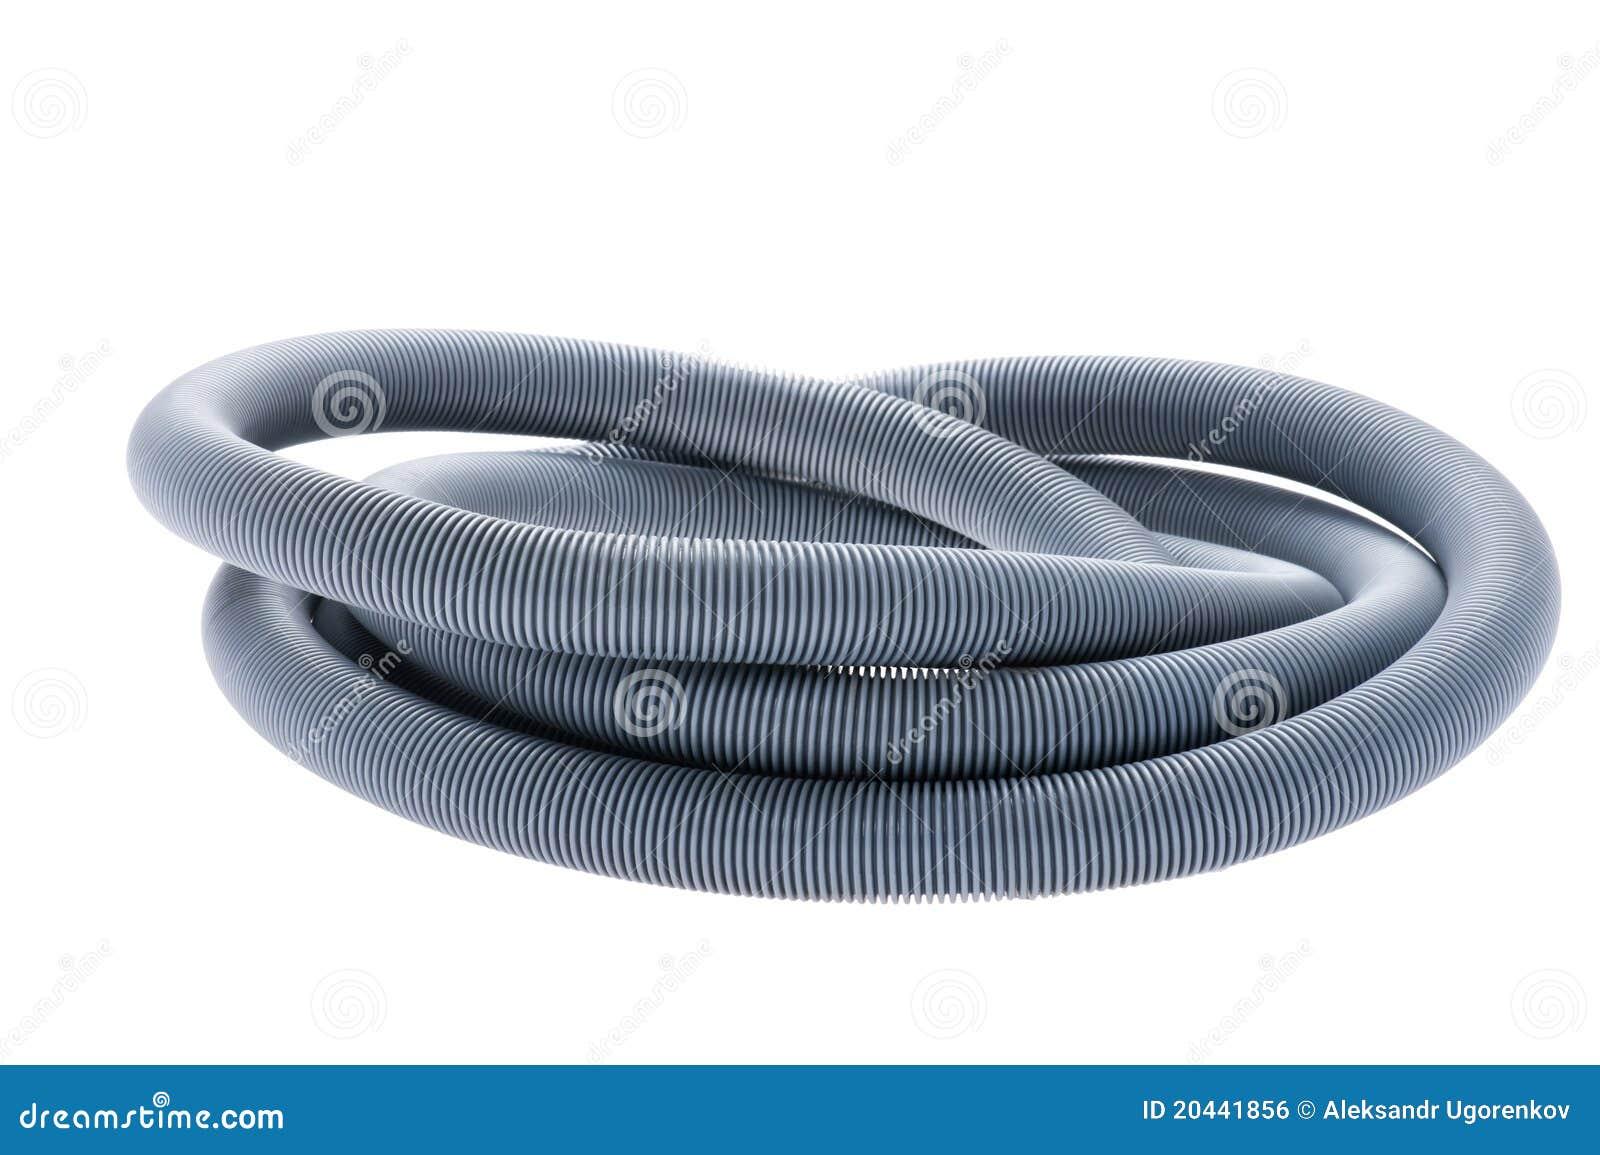 Plastic hose on white